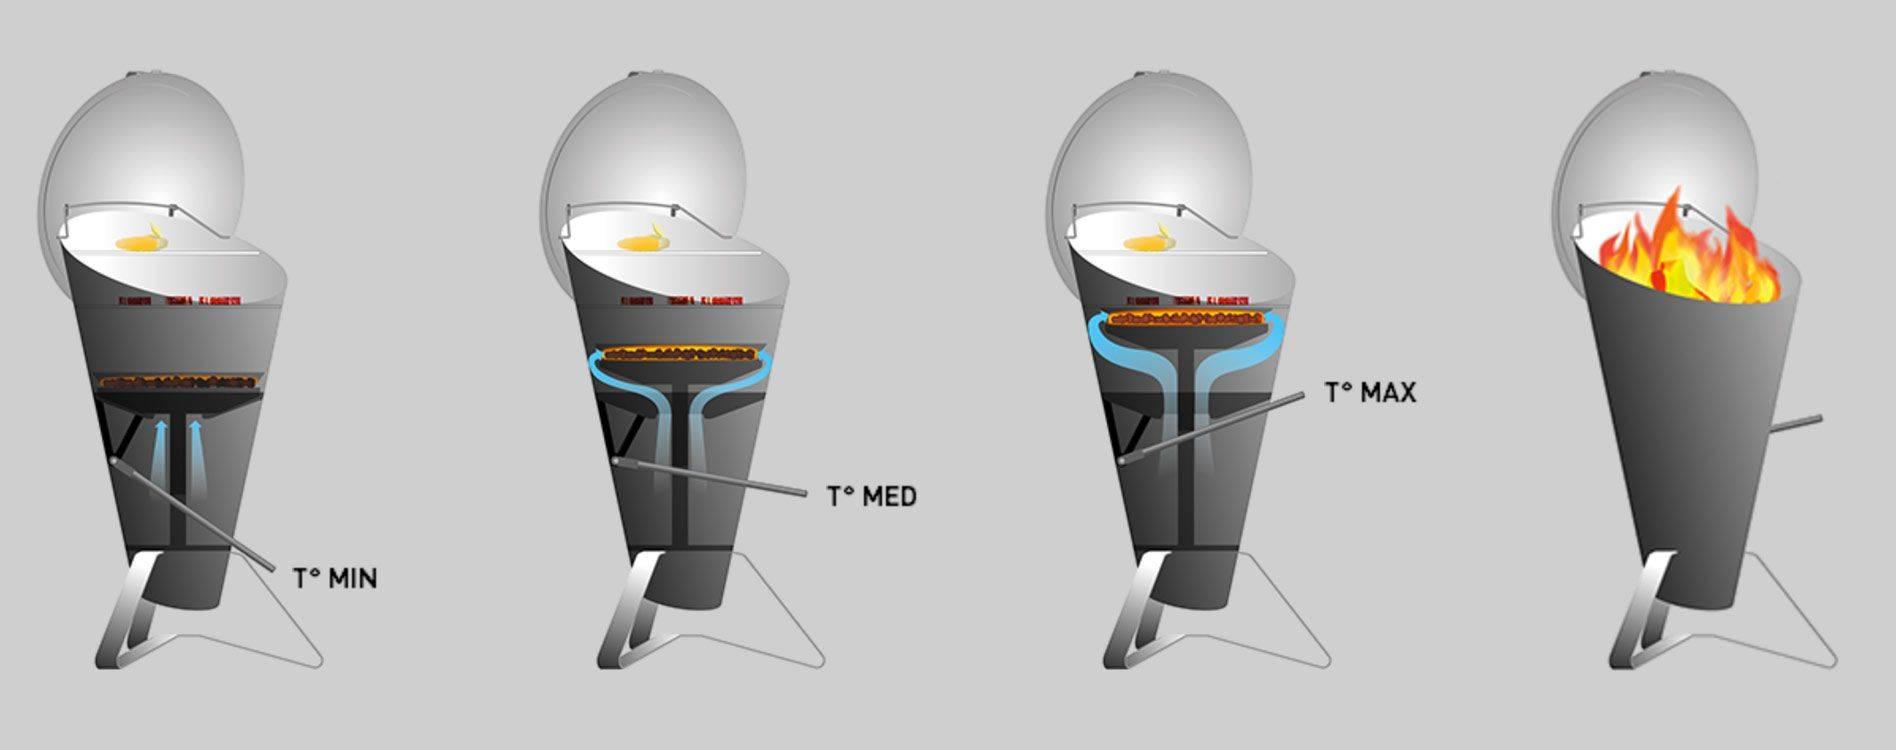 regulace teploty hofats cone